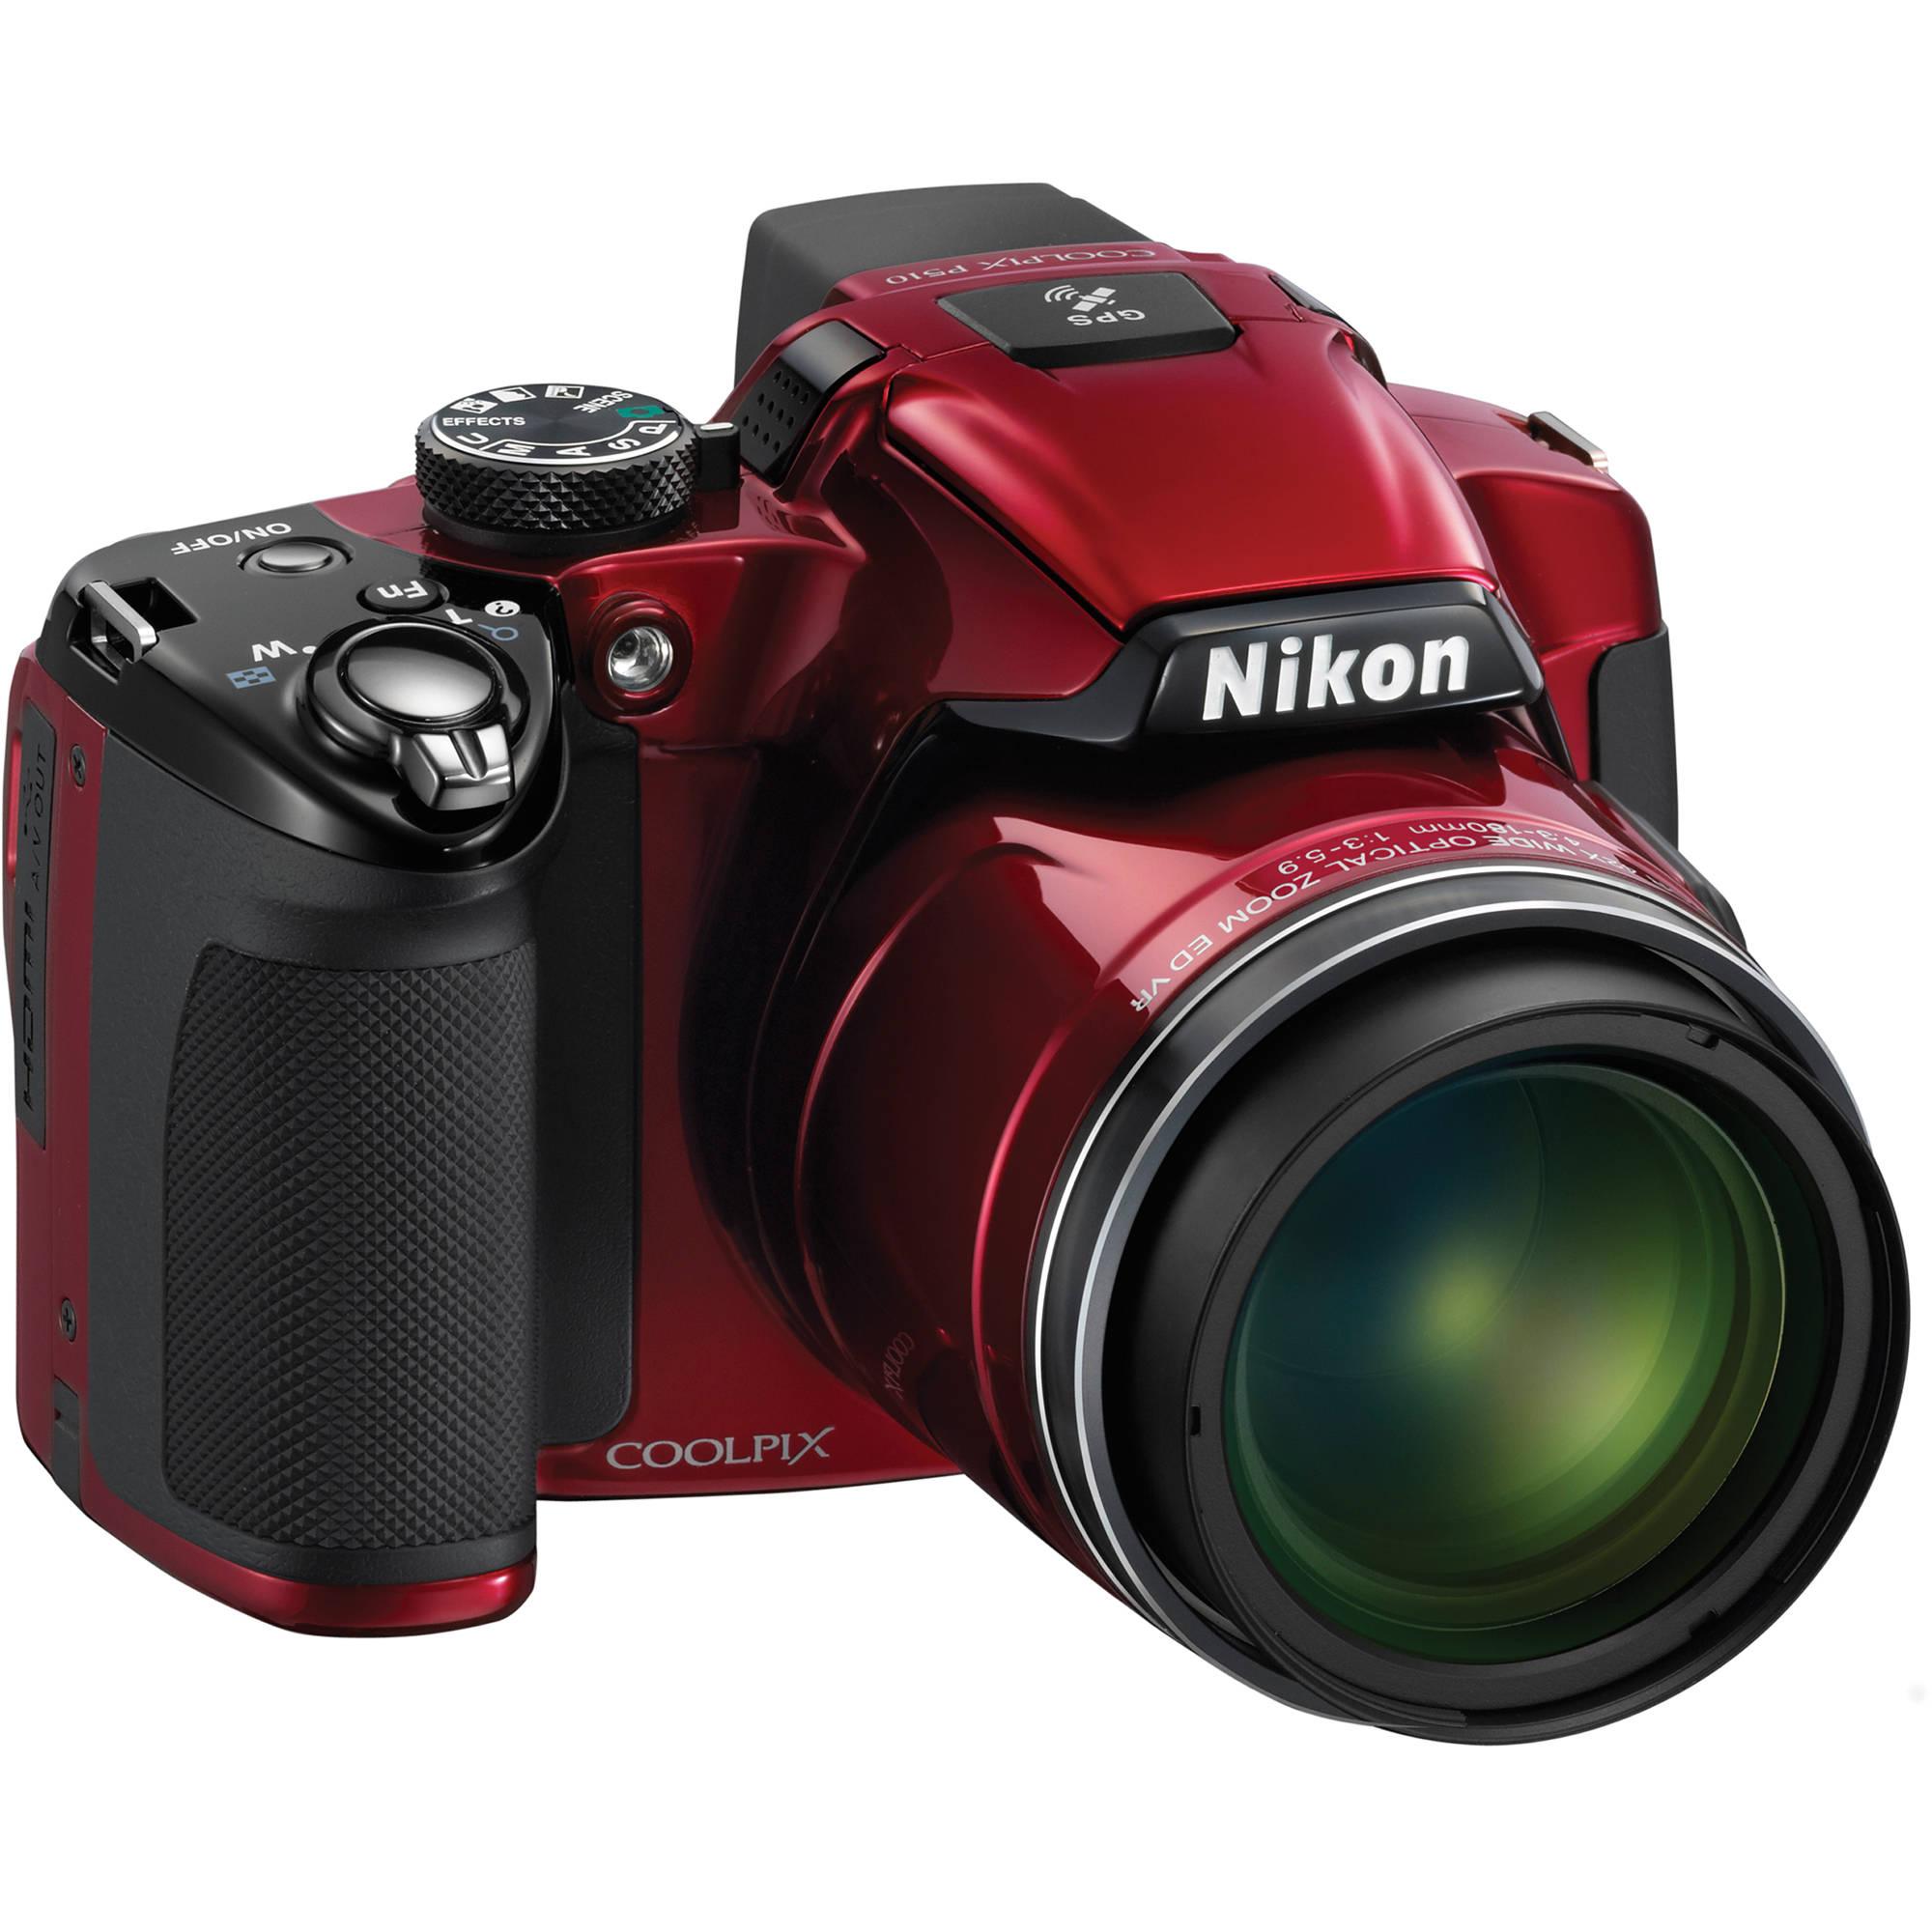 nikon coolpix p510 digital camera red 26330 b h photo video rh bhphotovideo com Nikon Coolpix P510 User Manual Nikon Coolpix P510 Camera